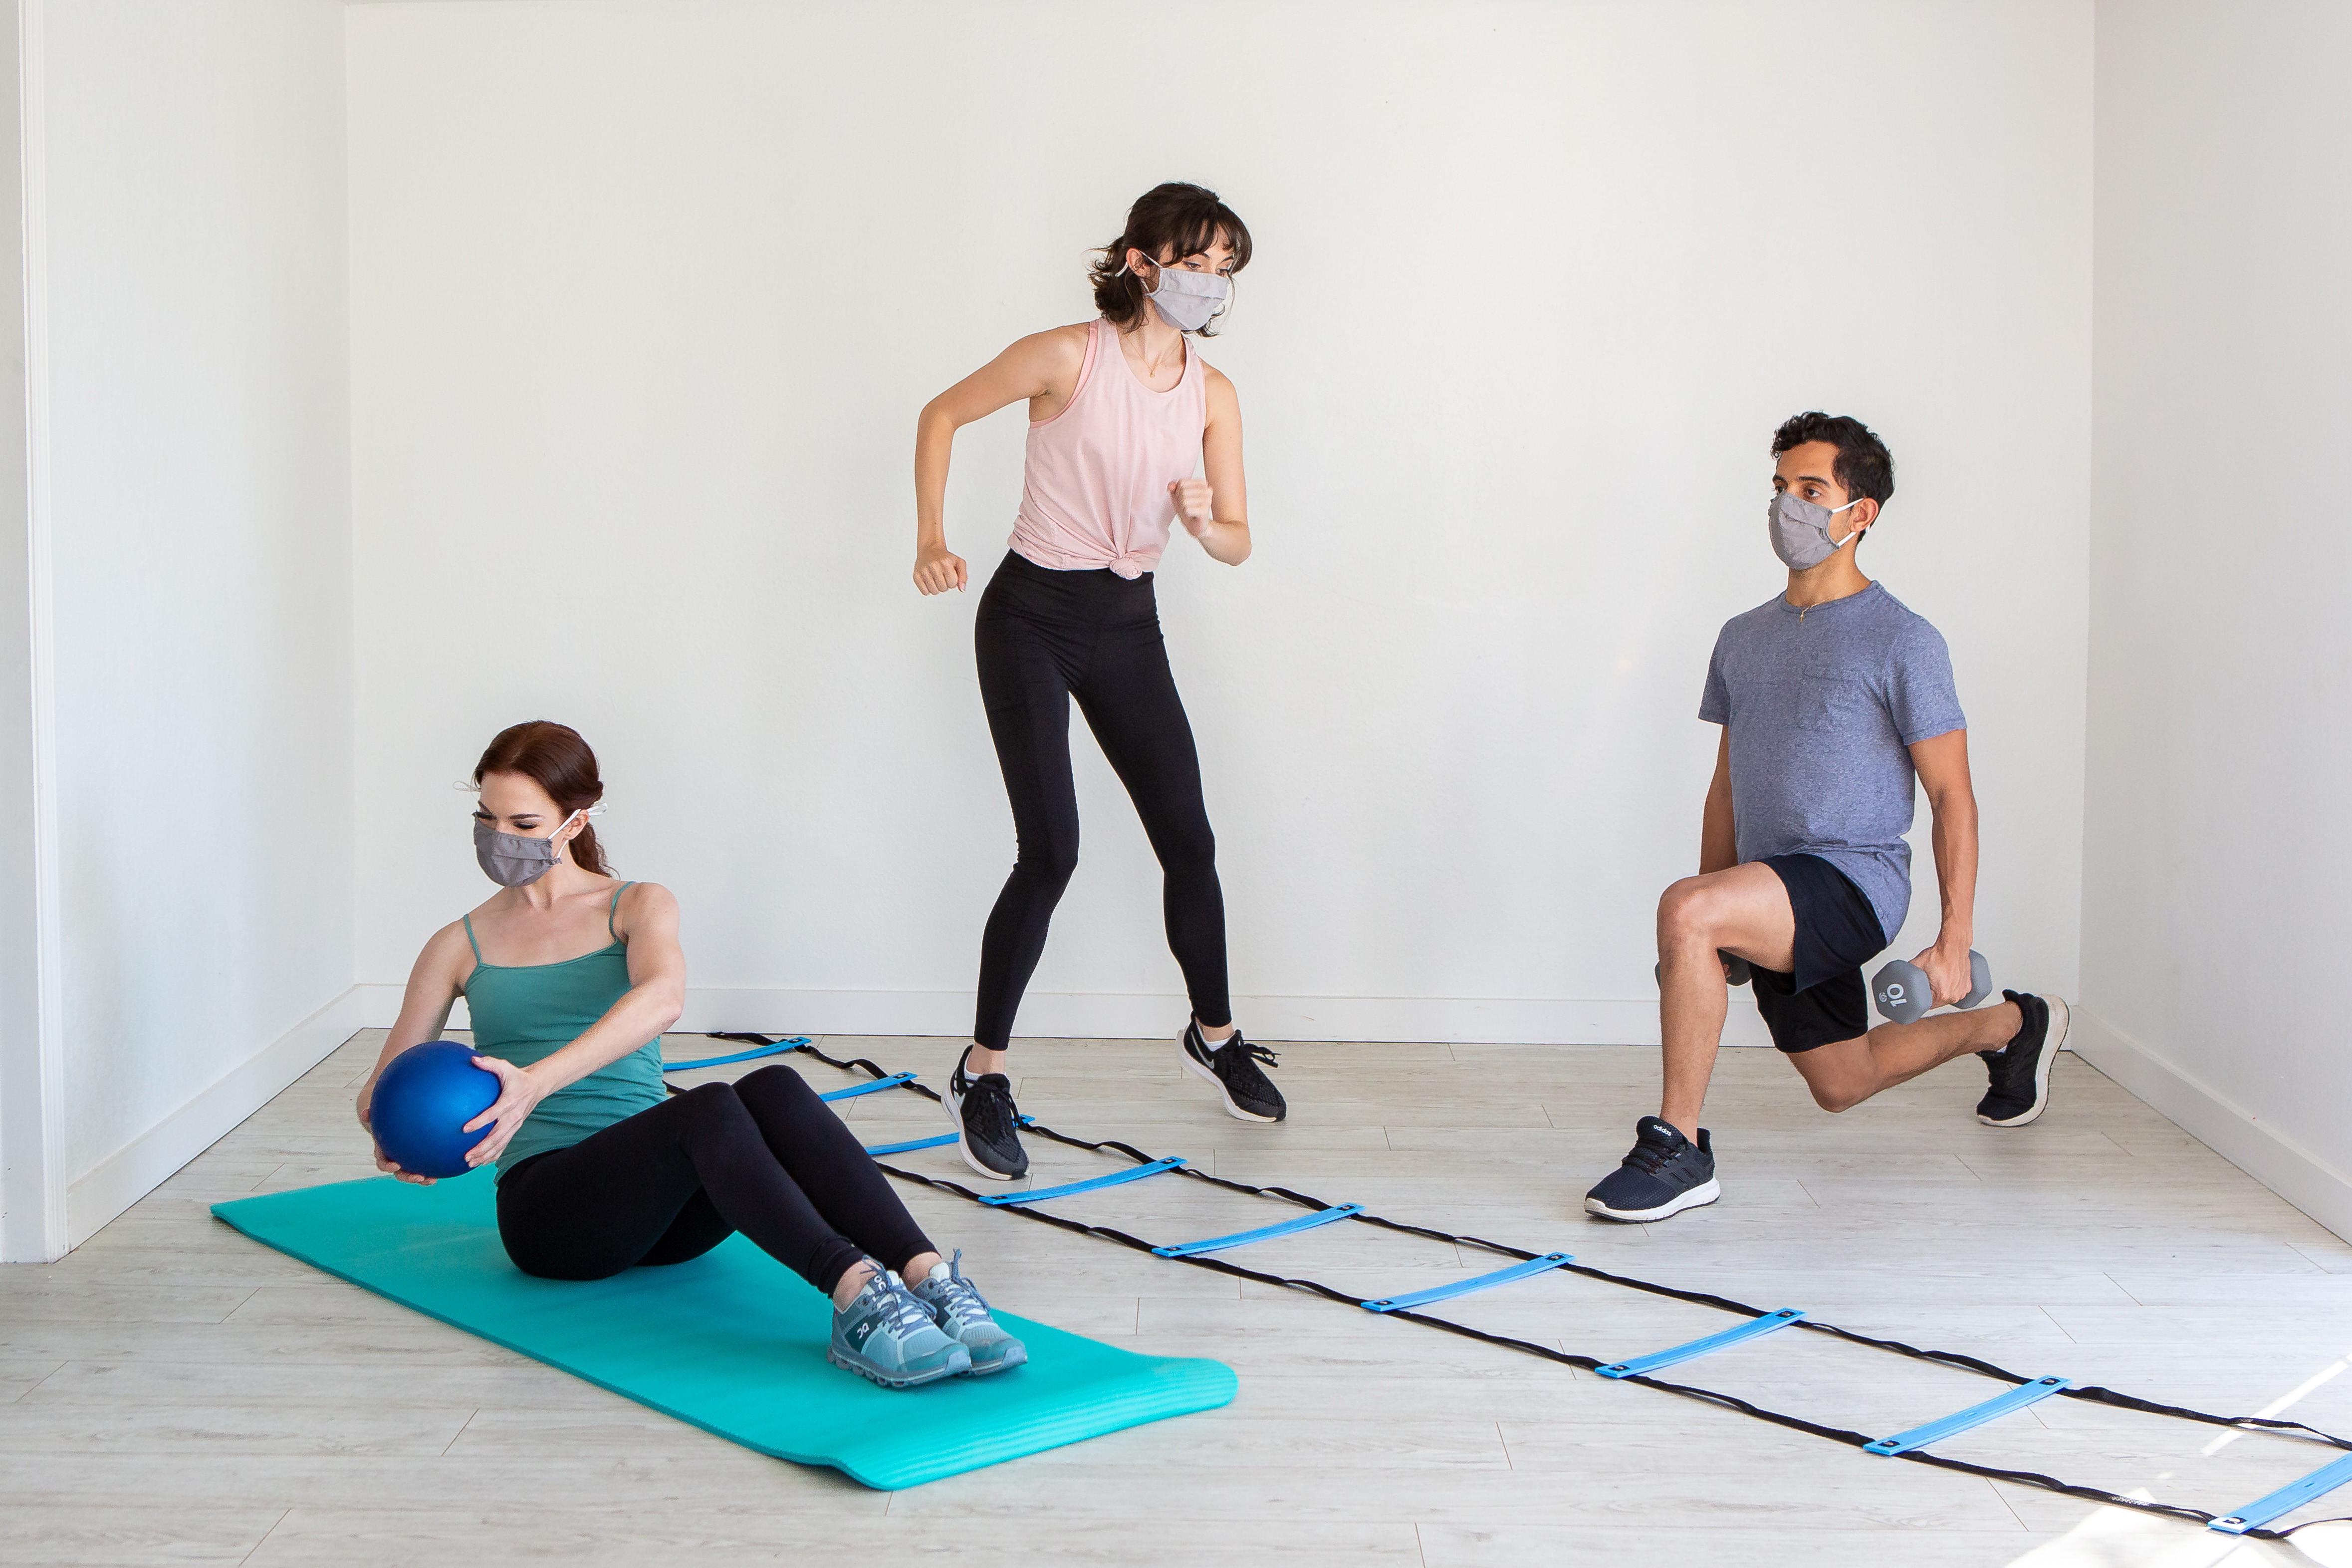 Performance / Strength Training Session